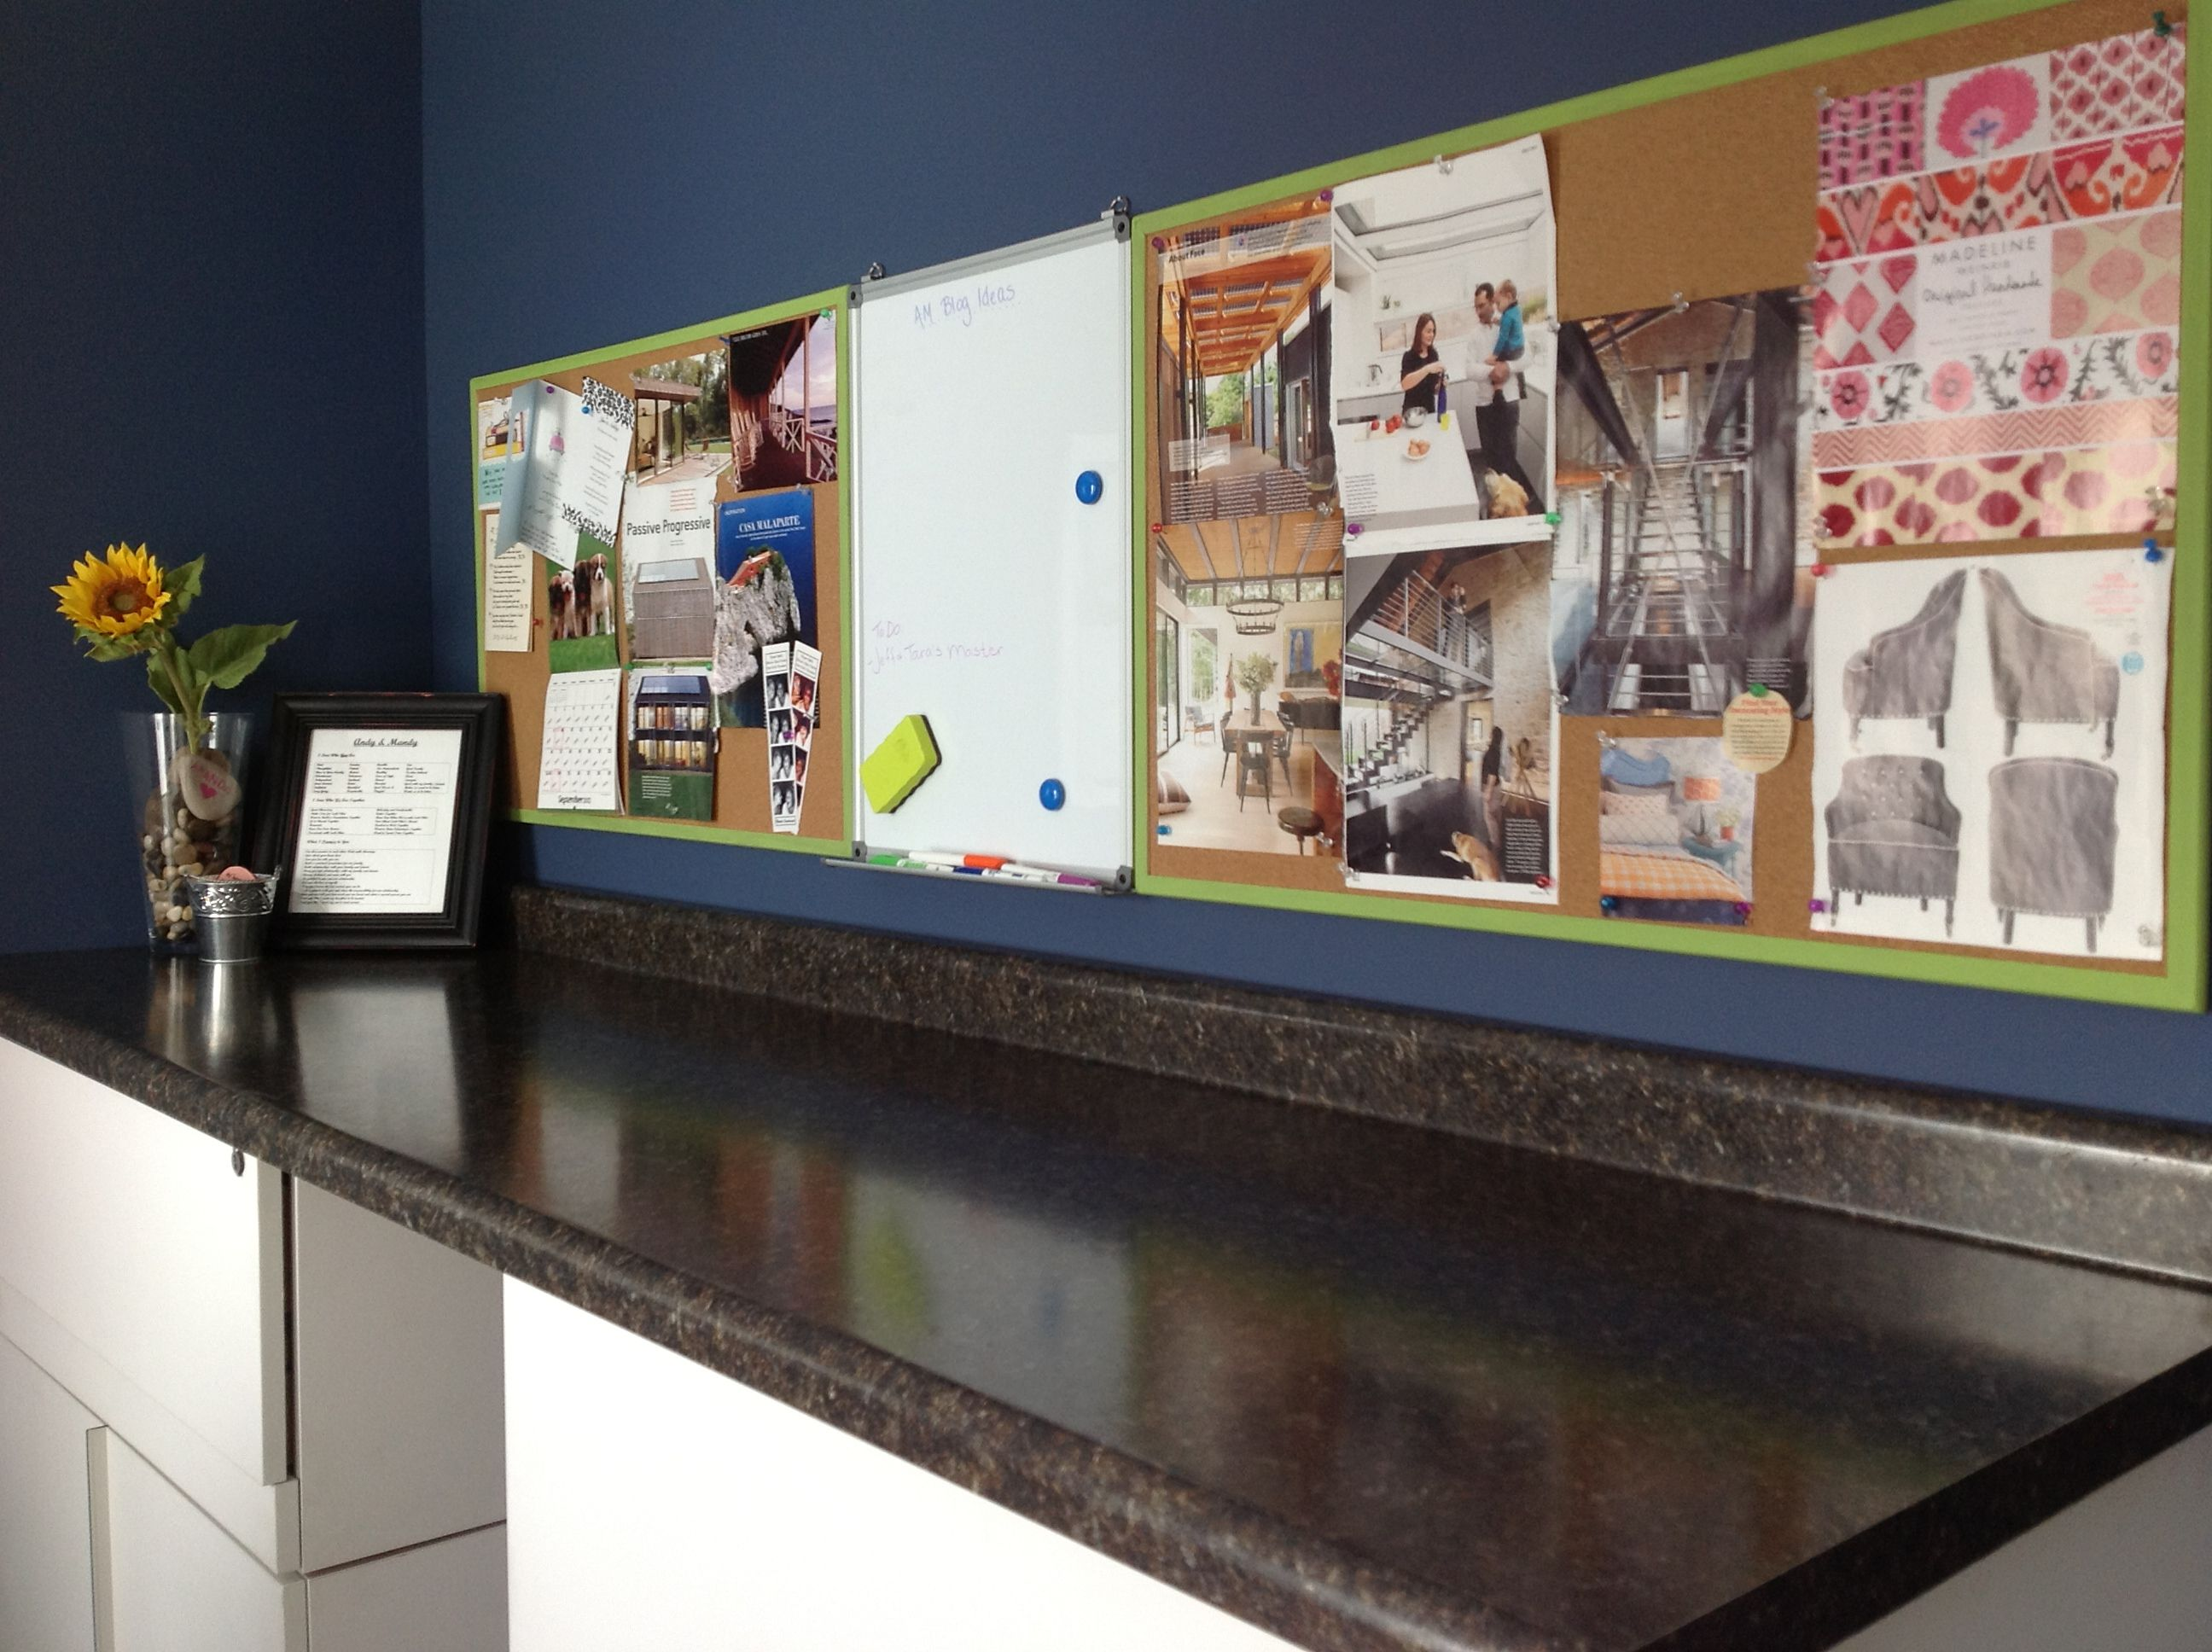 Furniture Kitchen Tile Backsplash Ideas Custom Kitchen Islands Menards Kitchen Countertops Small Kitchen Design For Small Houses Extraordinary Modern